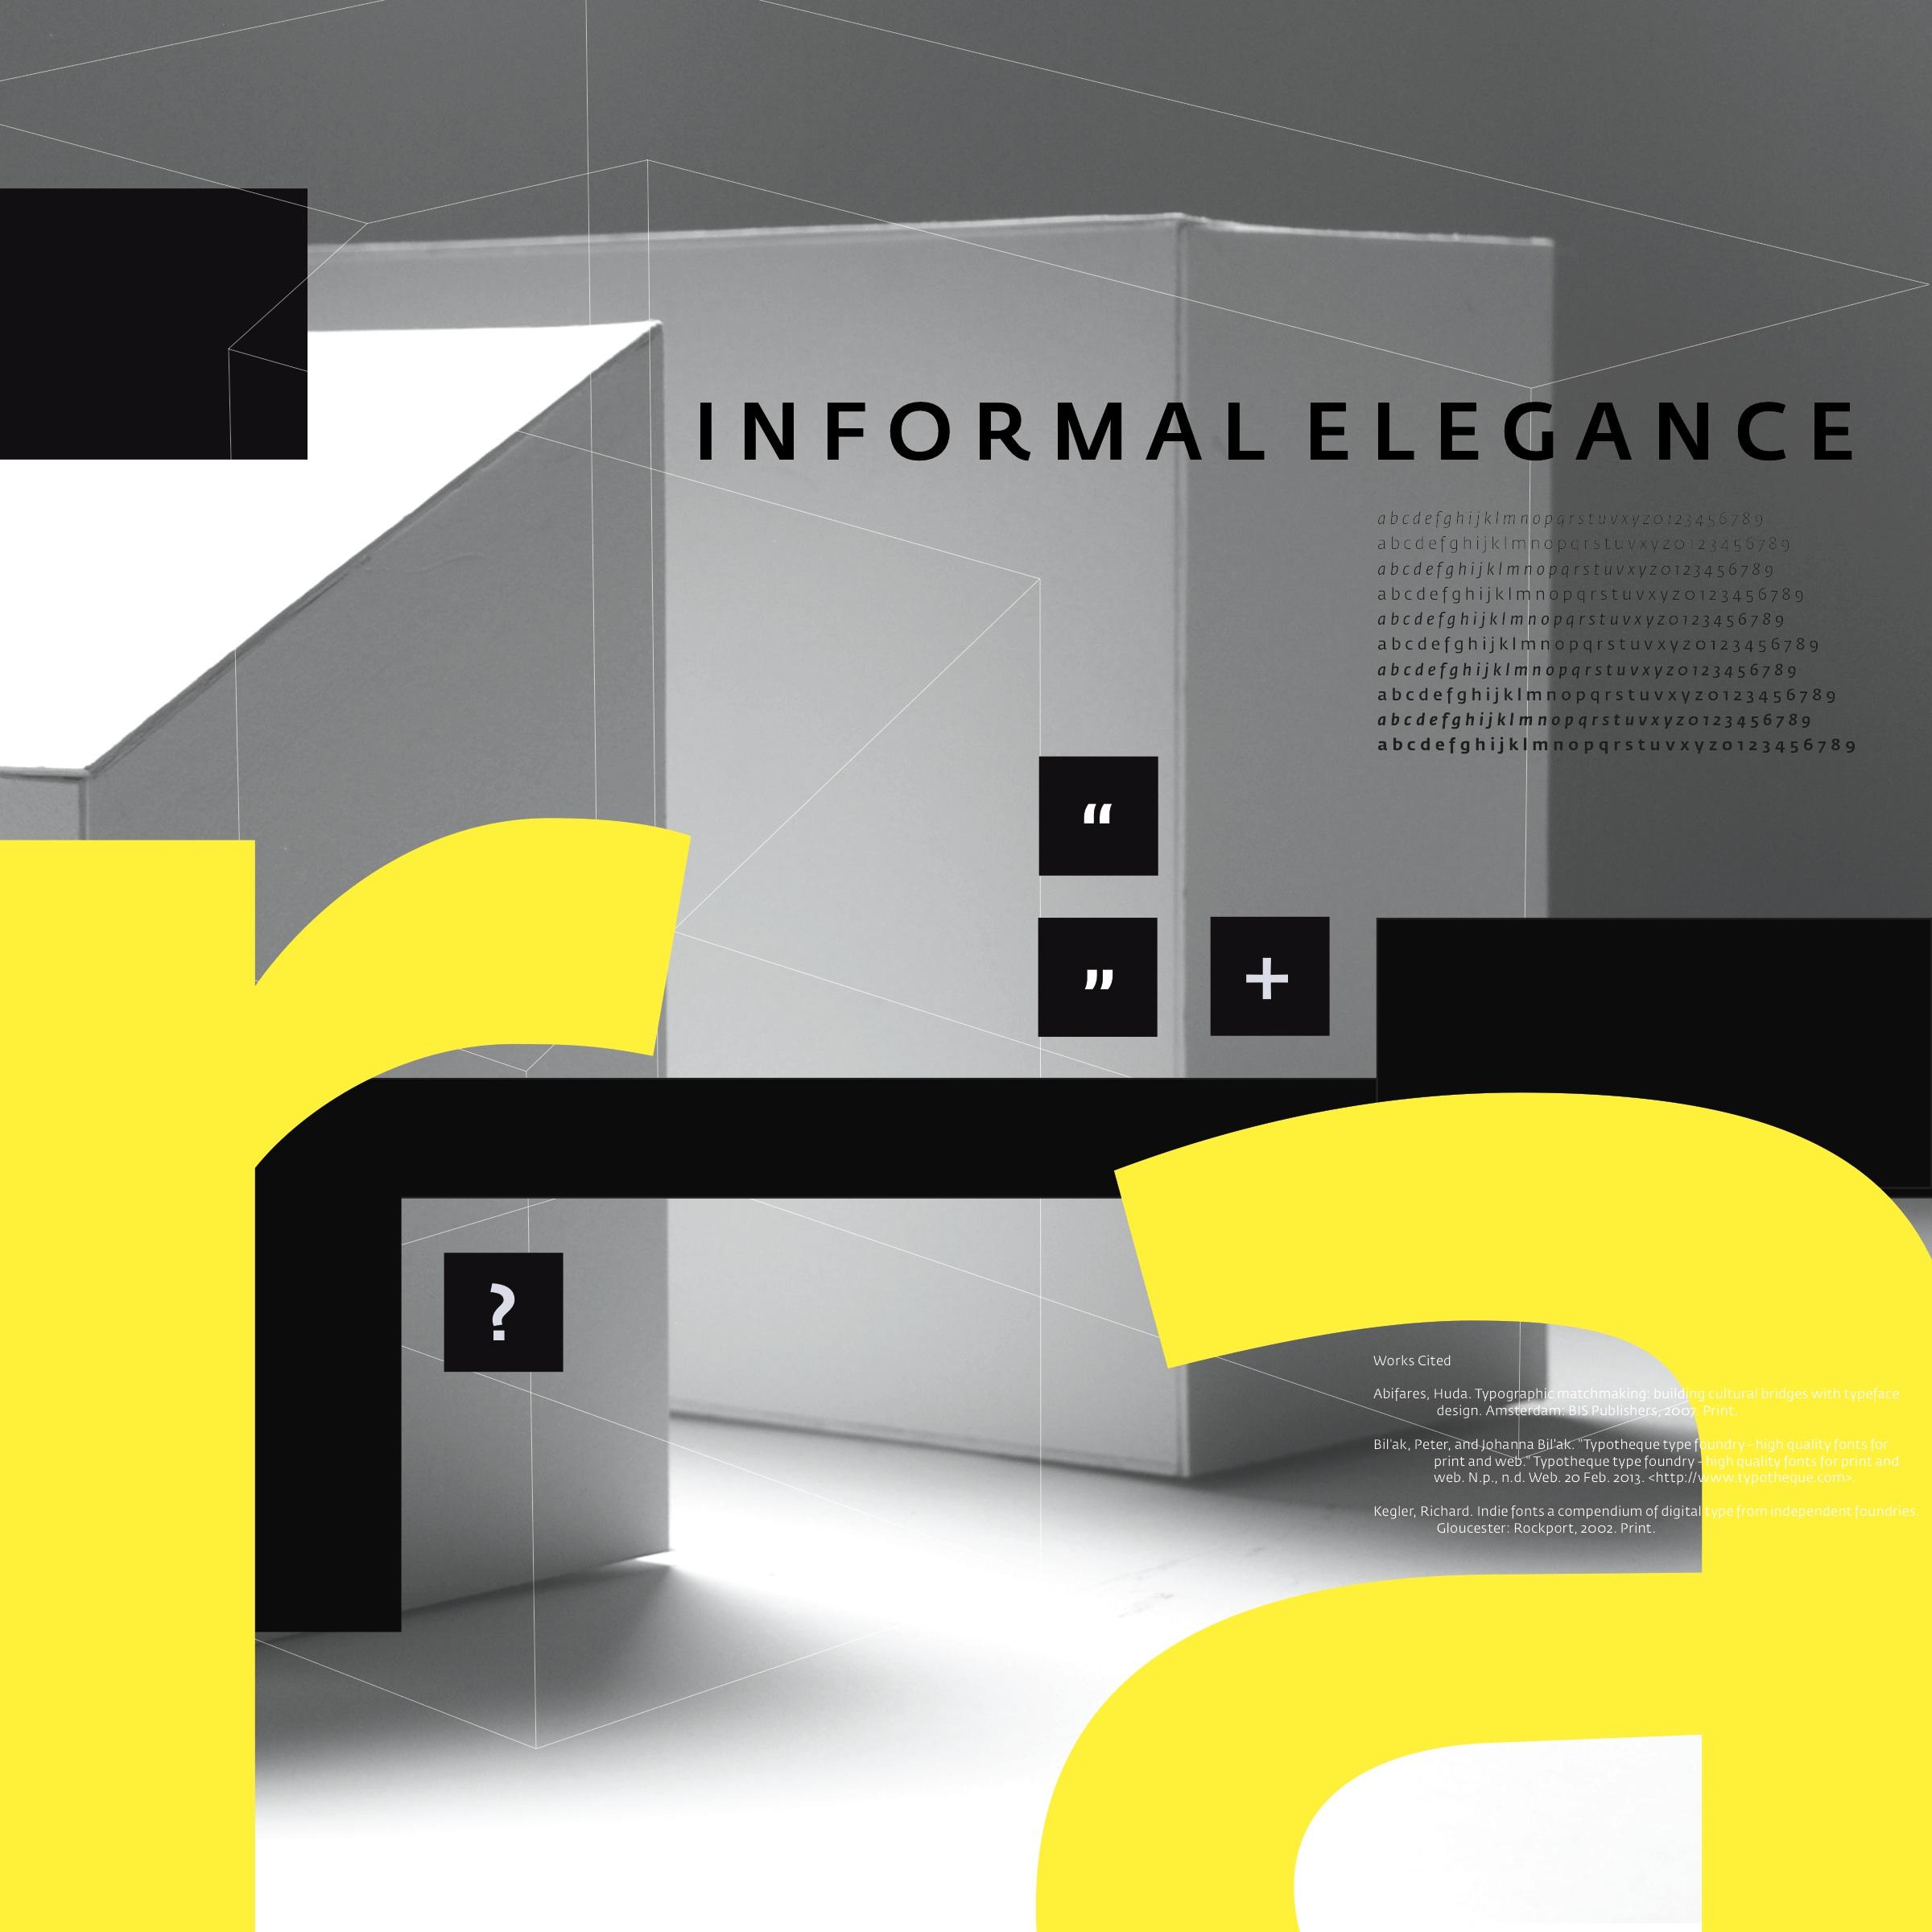 16x16_p3.jpg